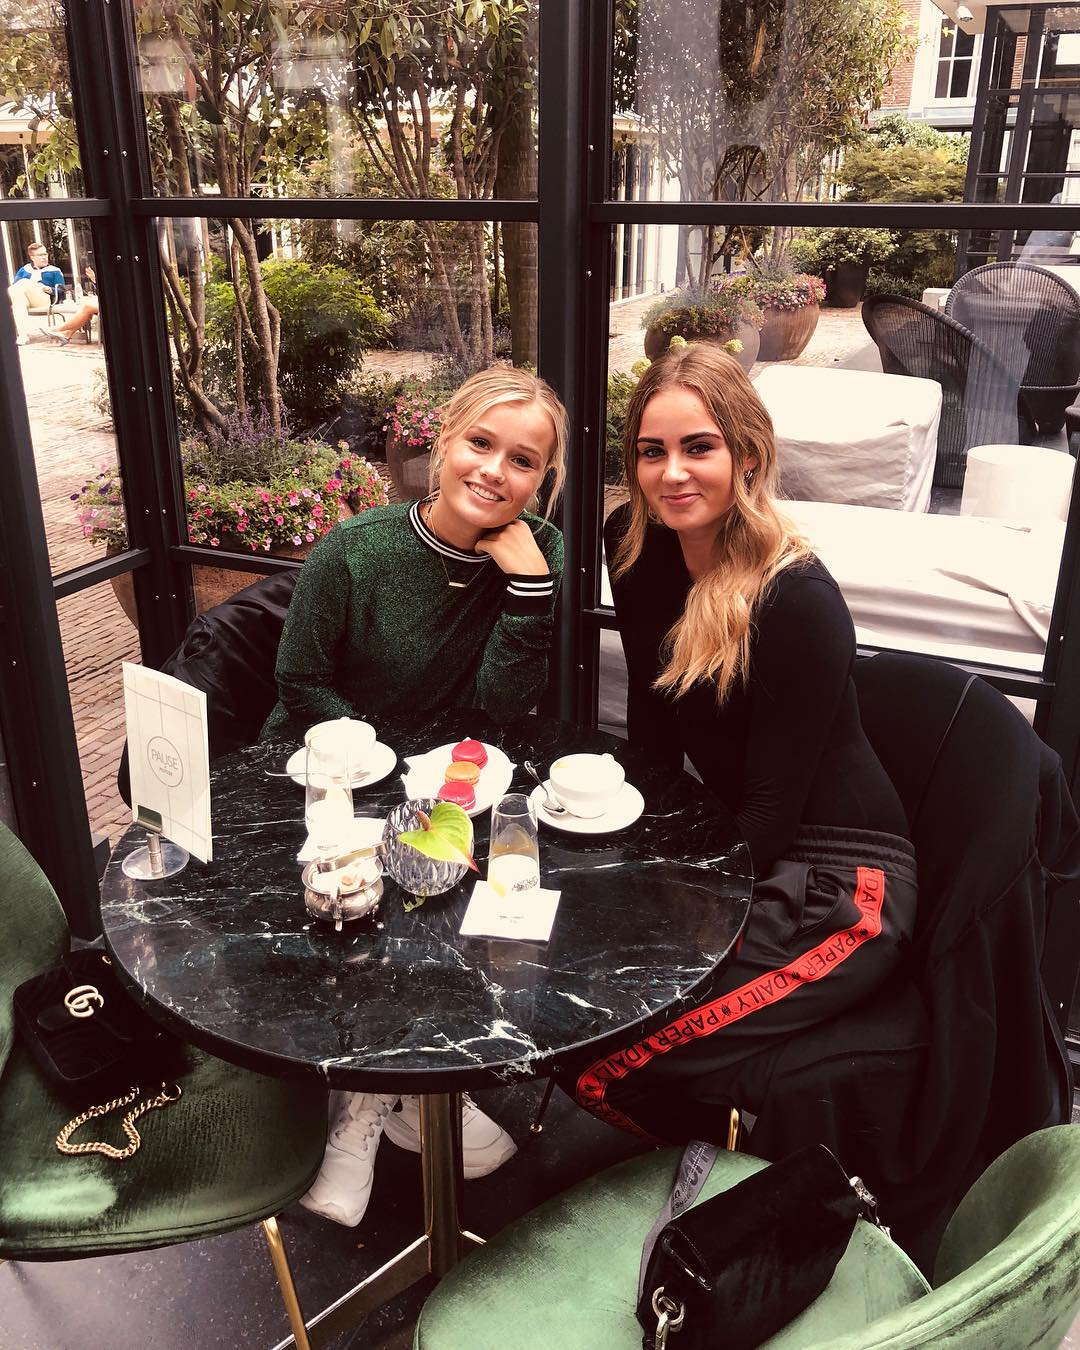 Donny van de Beek đang hẹn hò cùng Estelle Bergkamp hình ảnh gốc 5